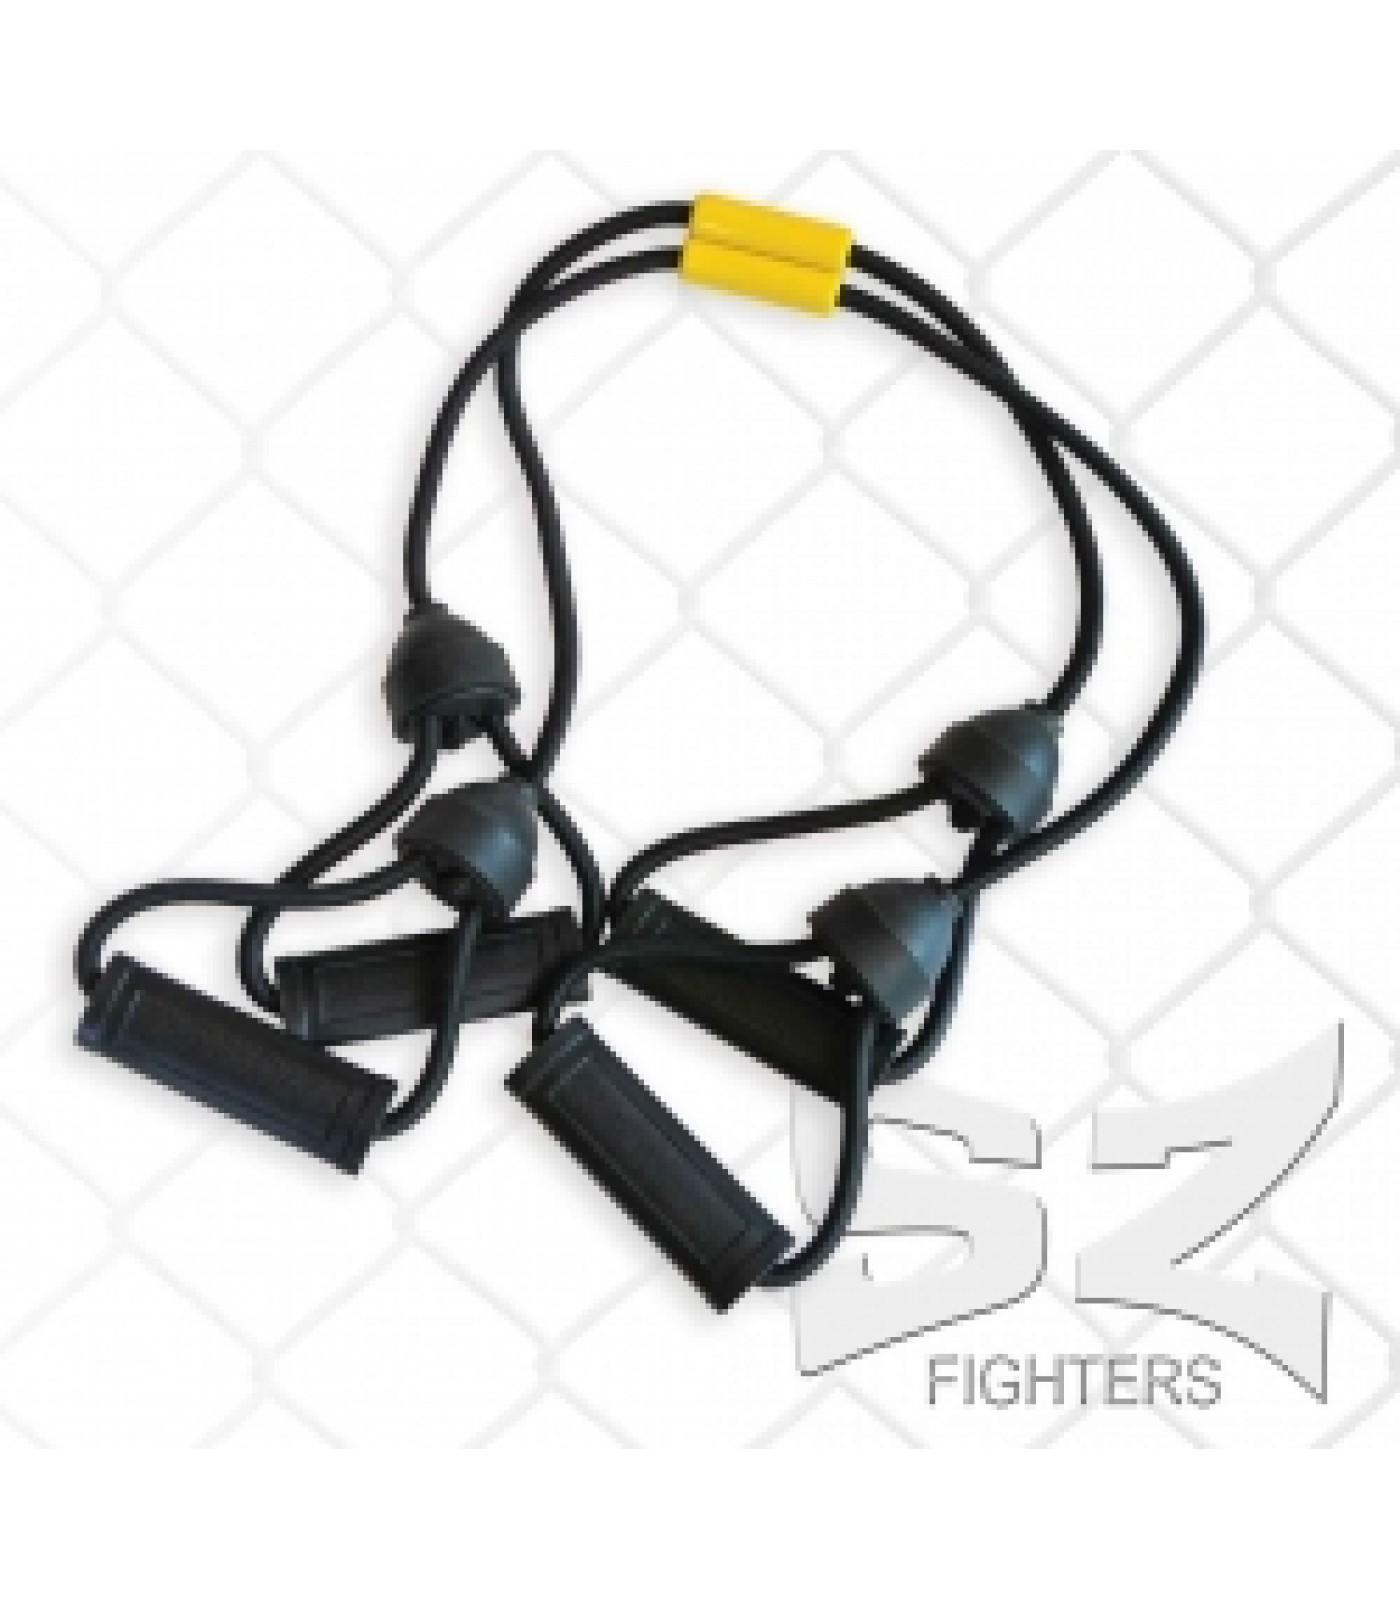 SZ Fighters - Тренировъчни ластици